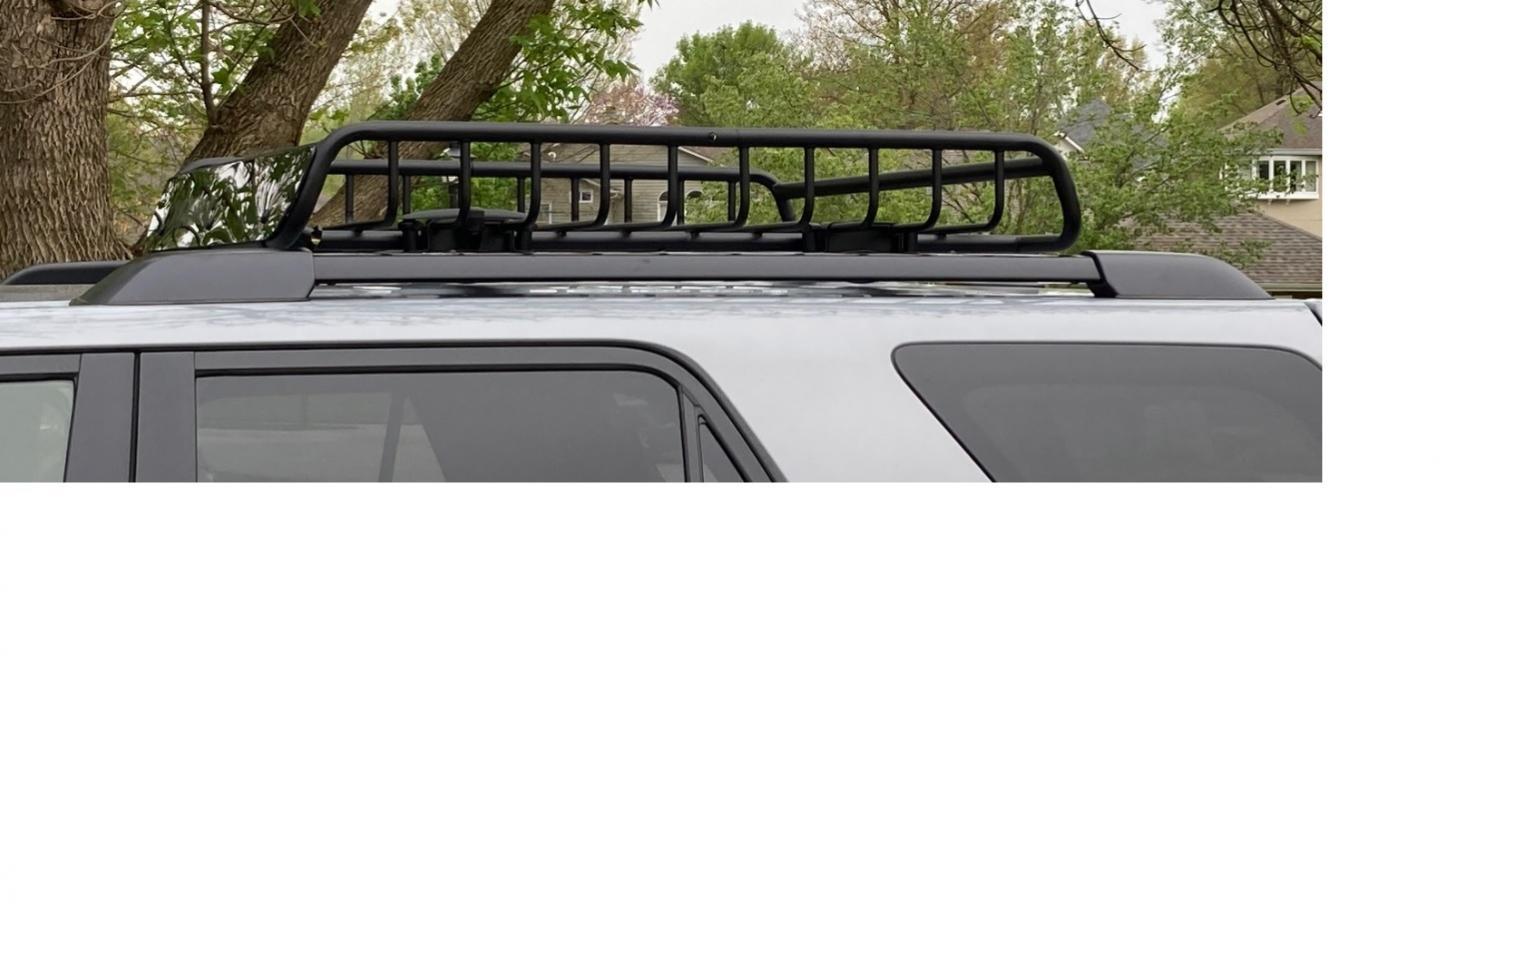 FS: Yakima LoadWarrior Roof Basket off 2021 Trail Edition - Brand New - 0/OBO-yakimarack-jpg